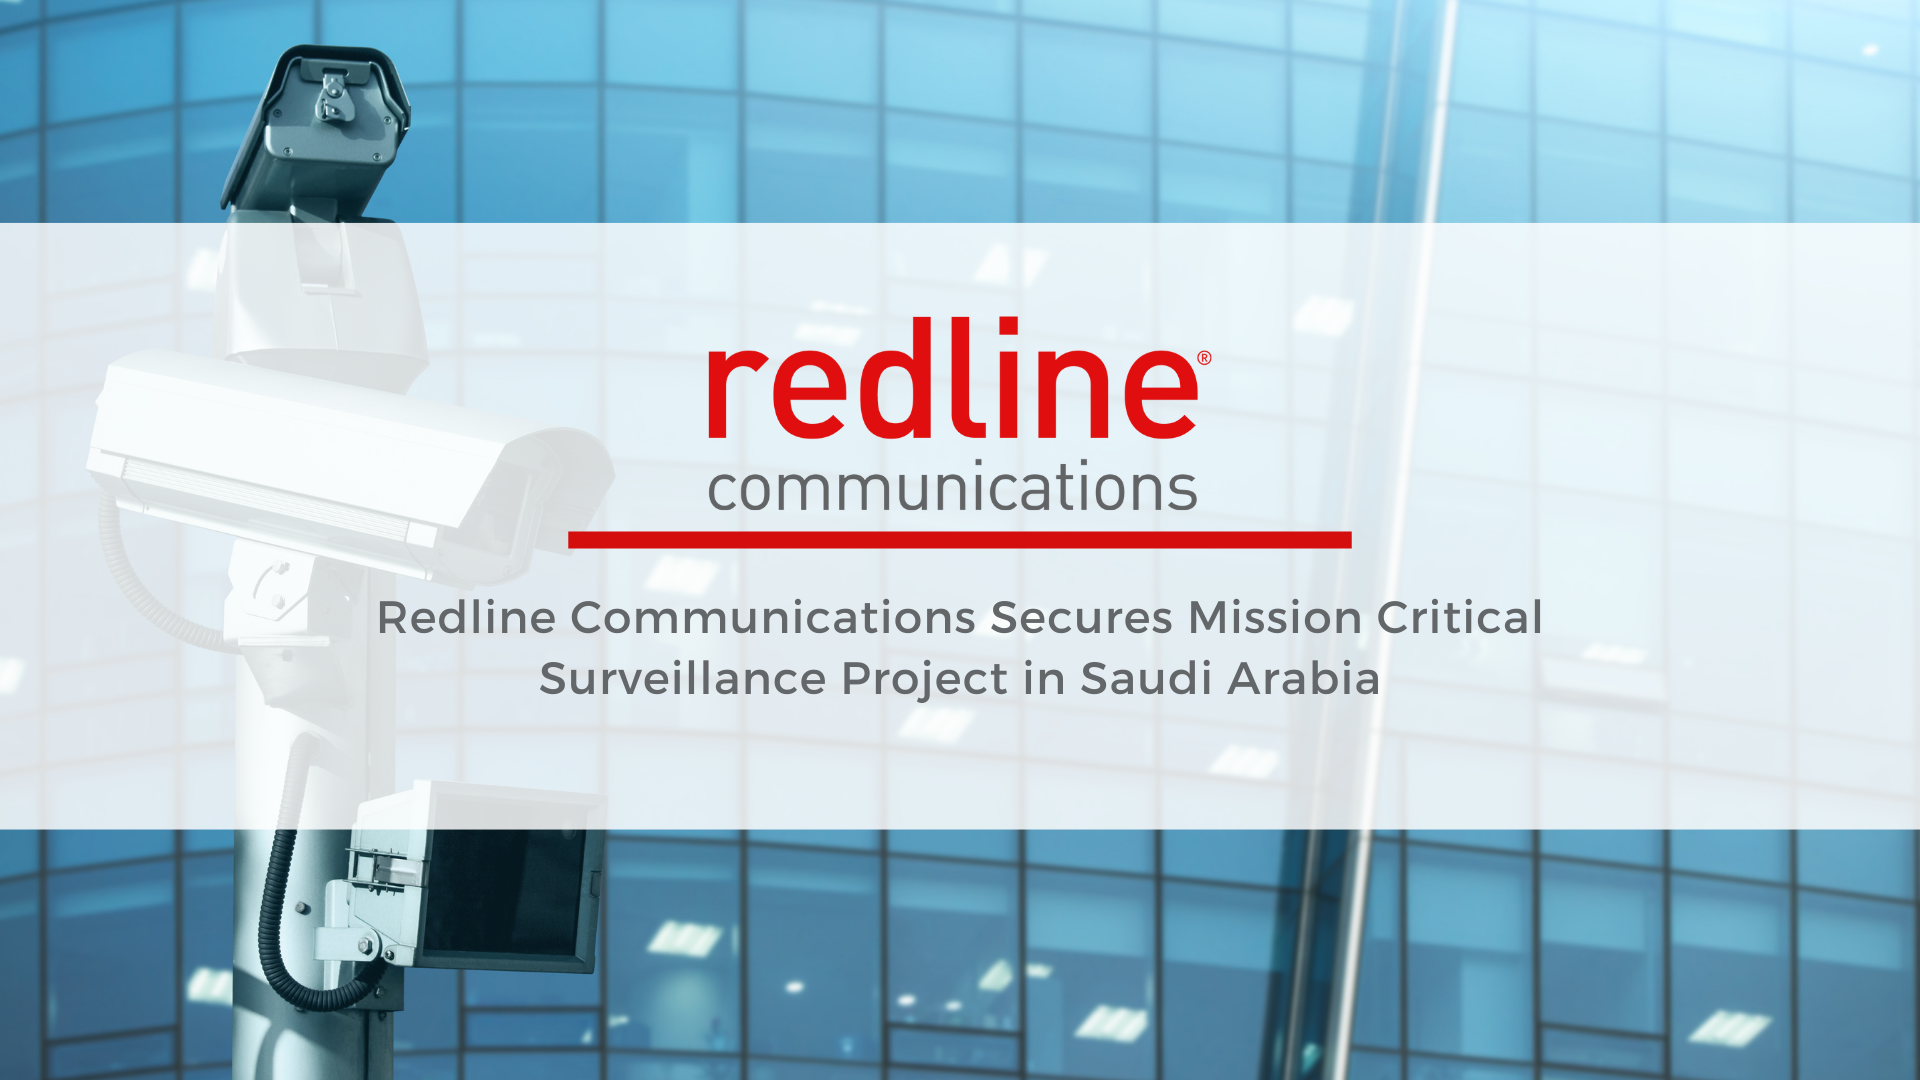 Redline Communications Secures Mission Critical Surveillance Project in Saudi Arabia